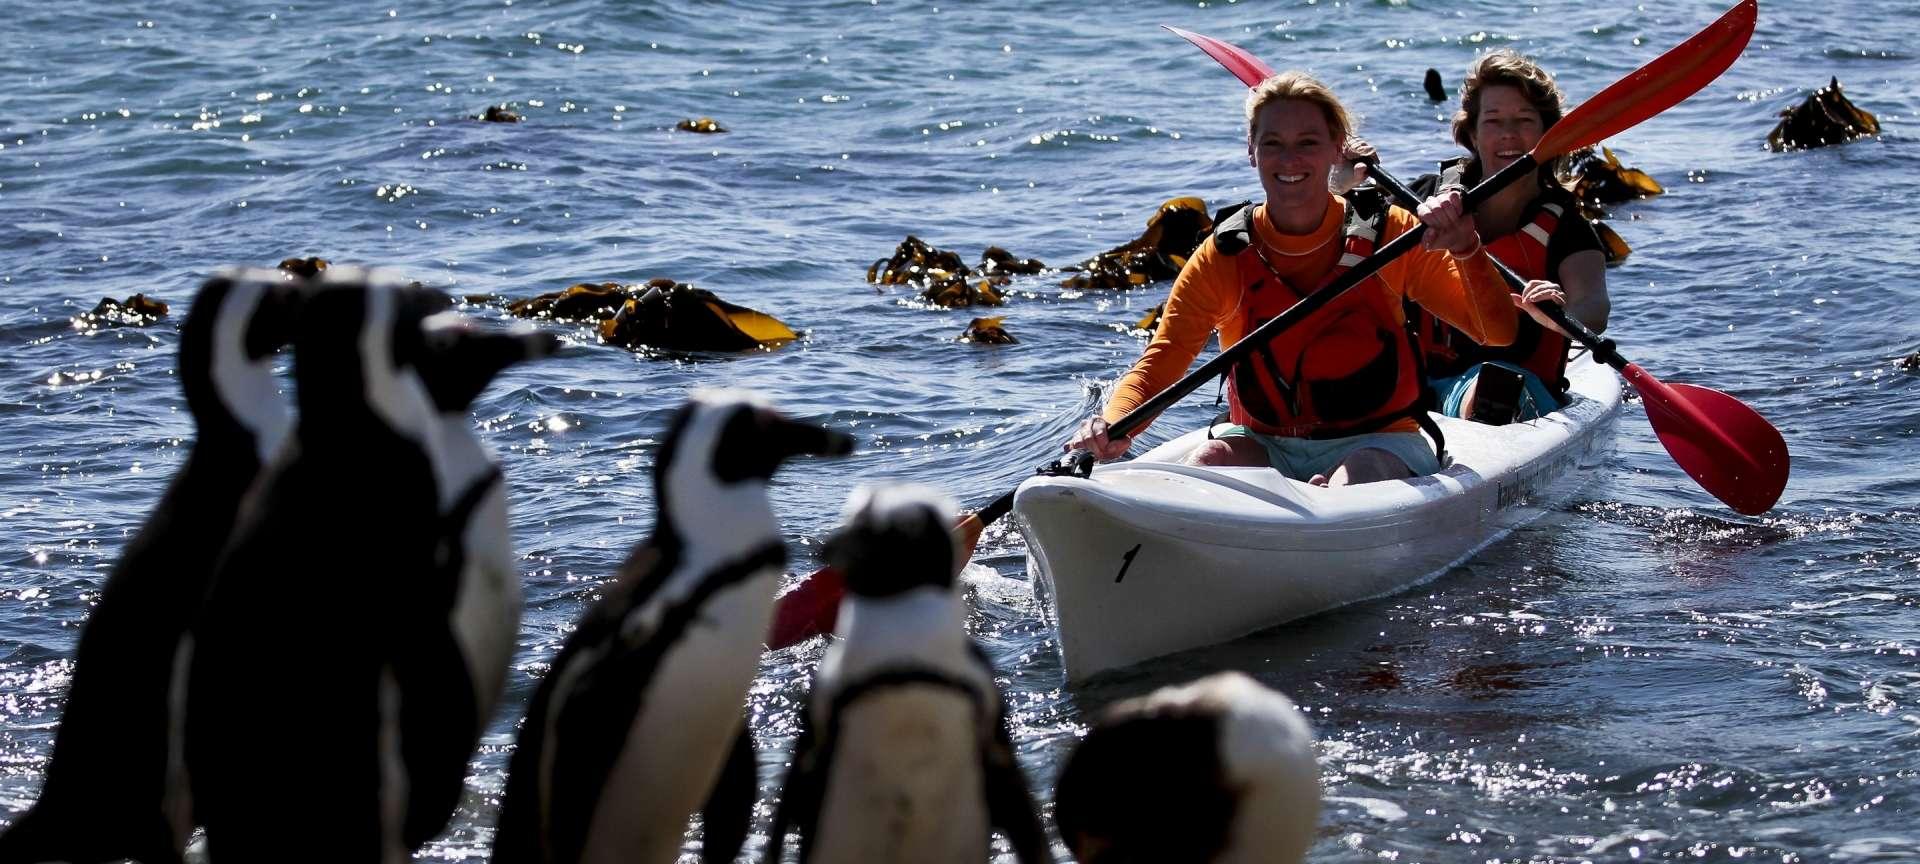 Western Cape - Africa Wildlife Safaris